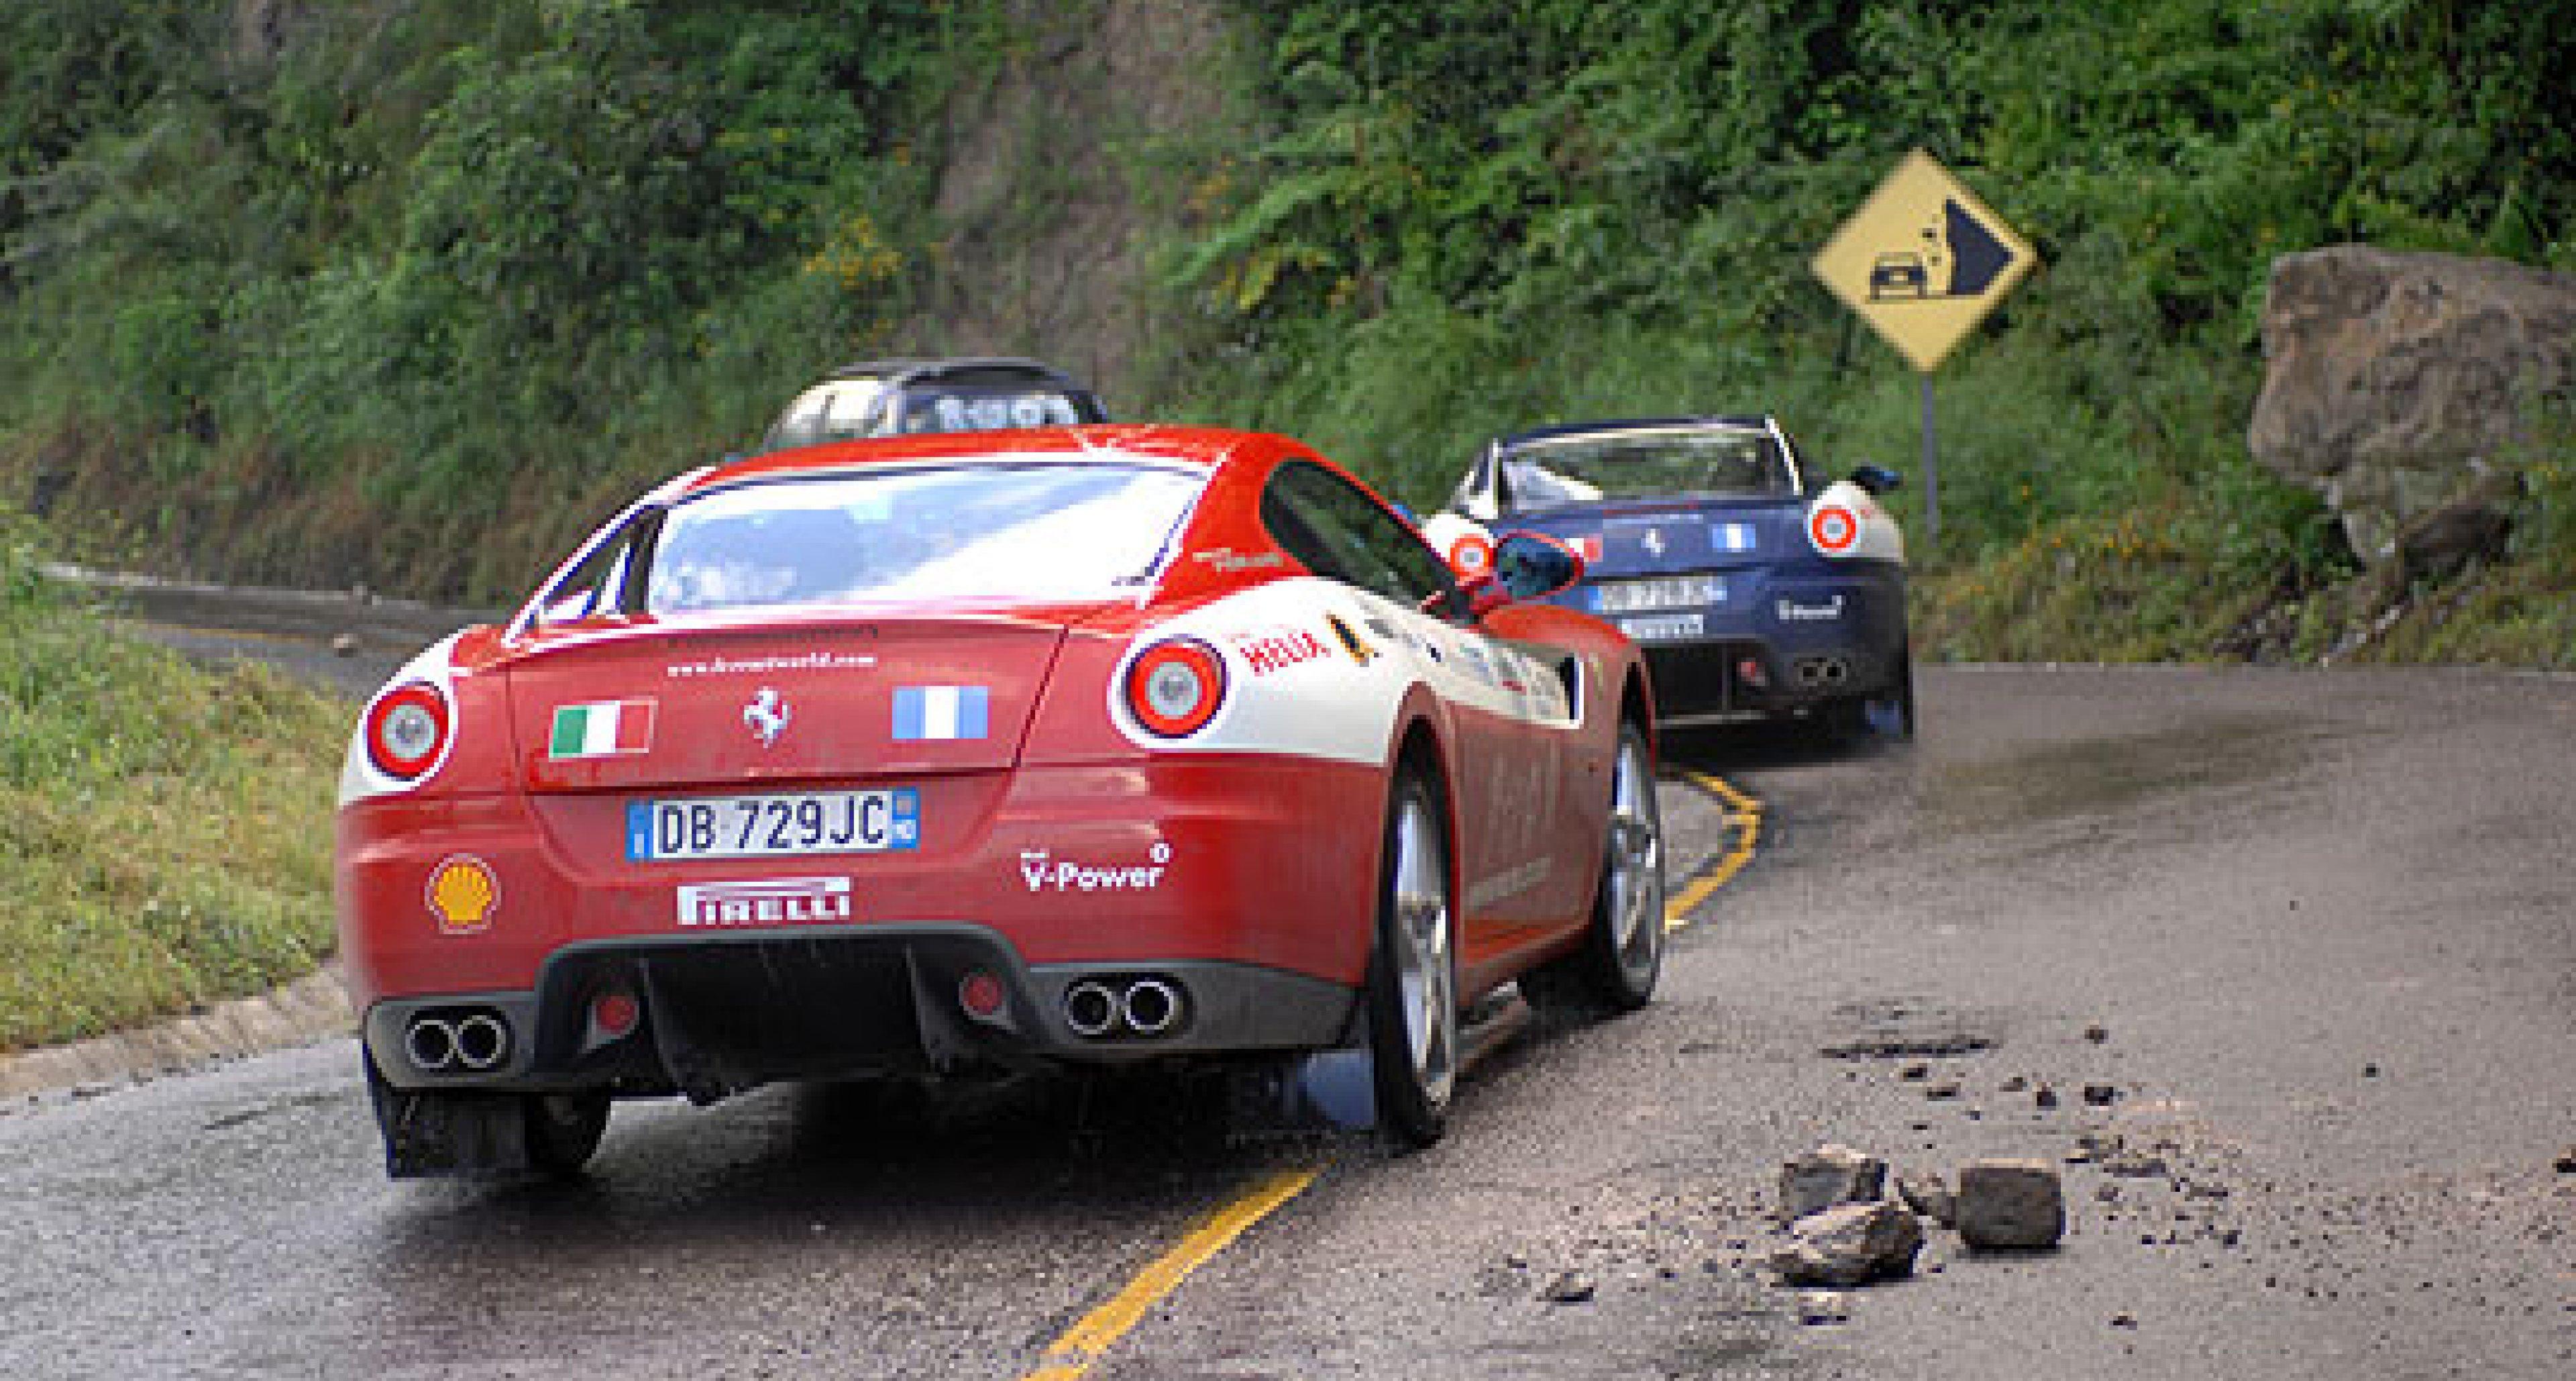 Ferrari Panamerican 20,000 - the latest news